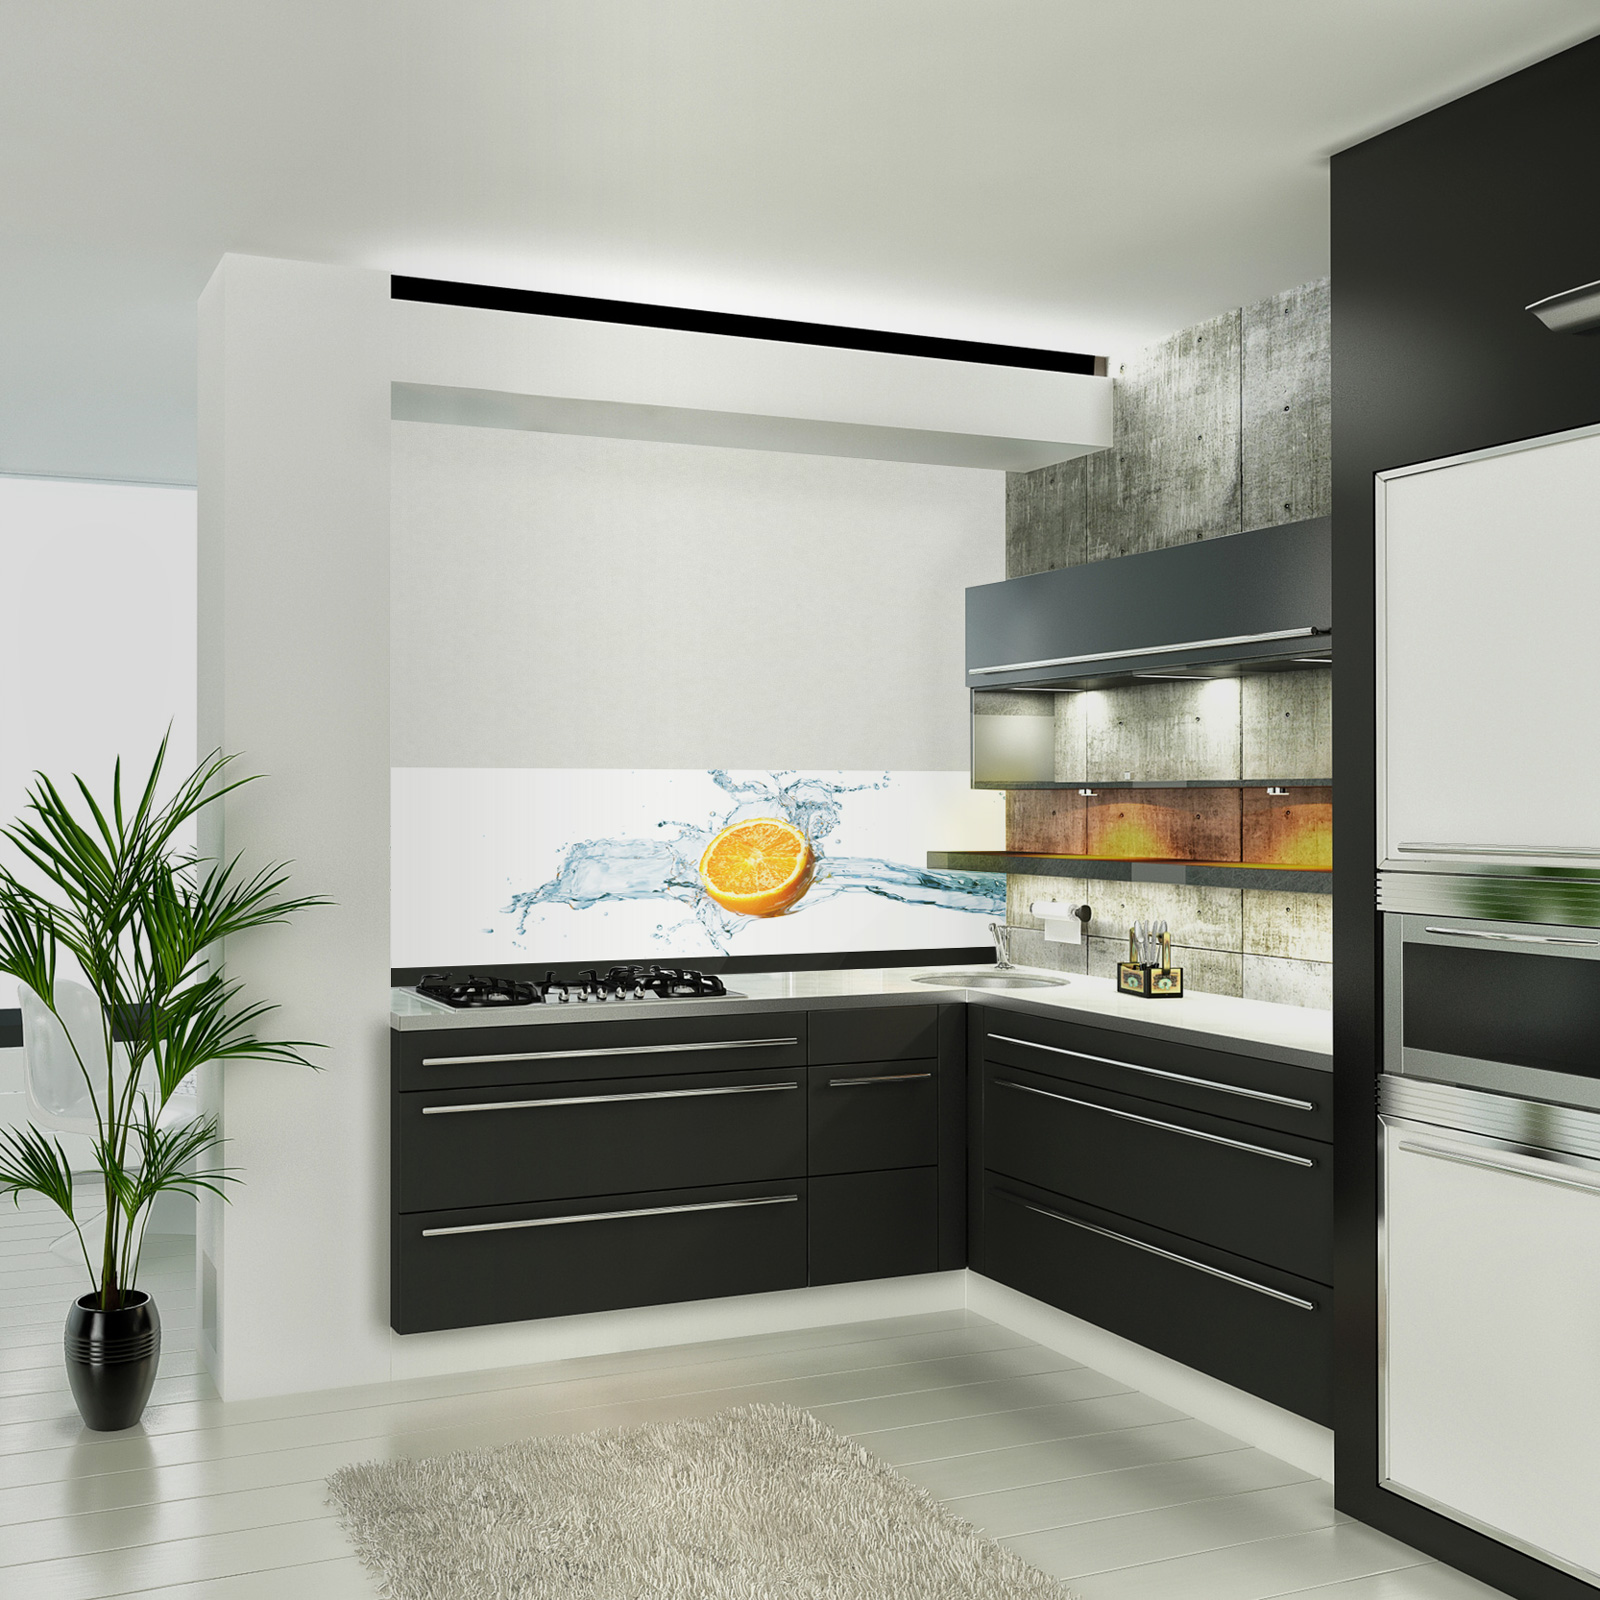 glasbild zitrone. Black Bedroom Furniture Sets. Home Design Ideas